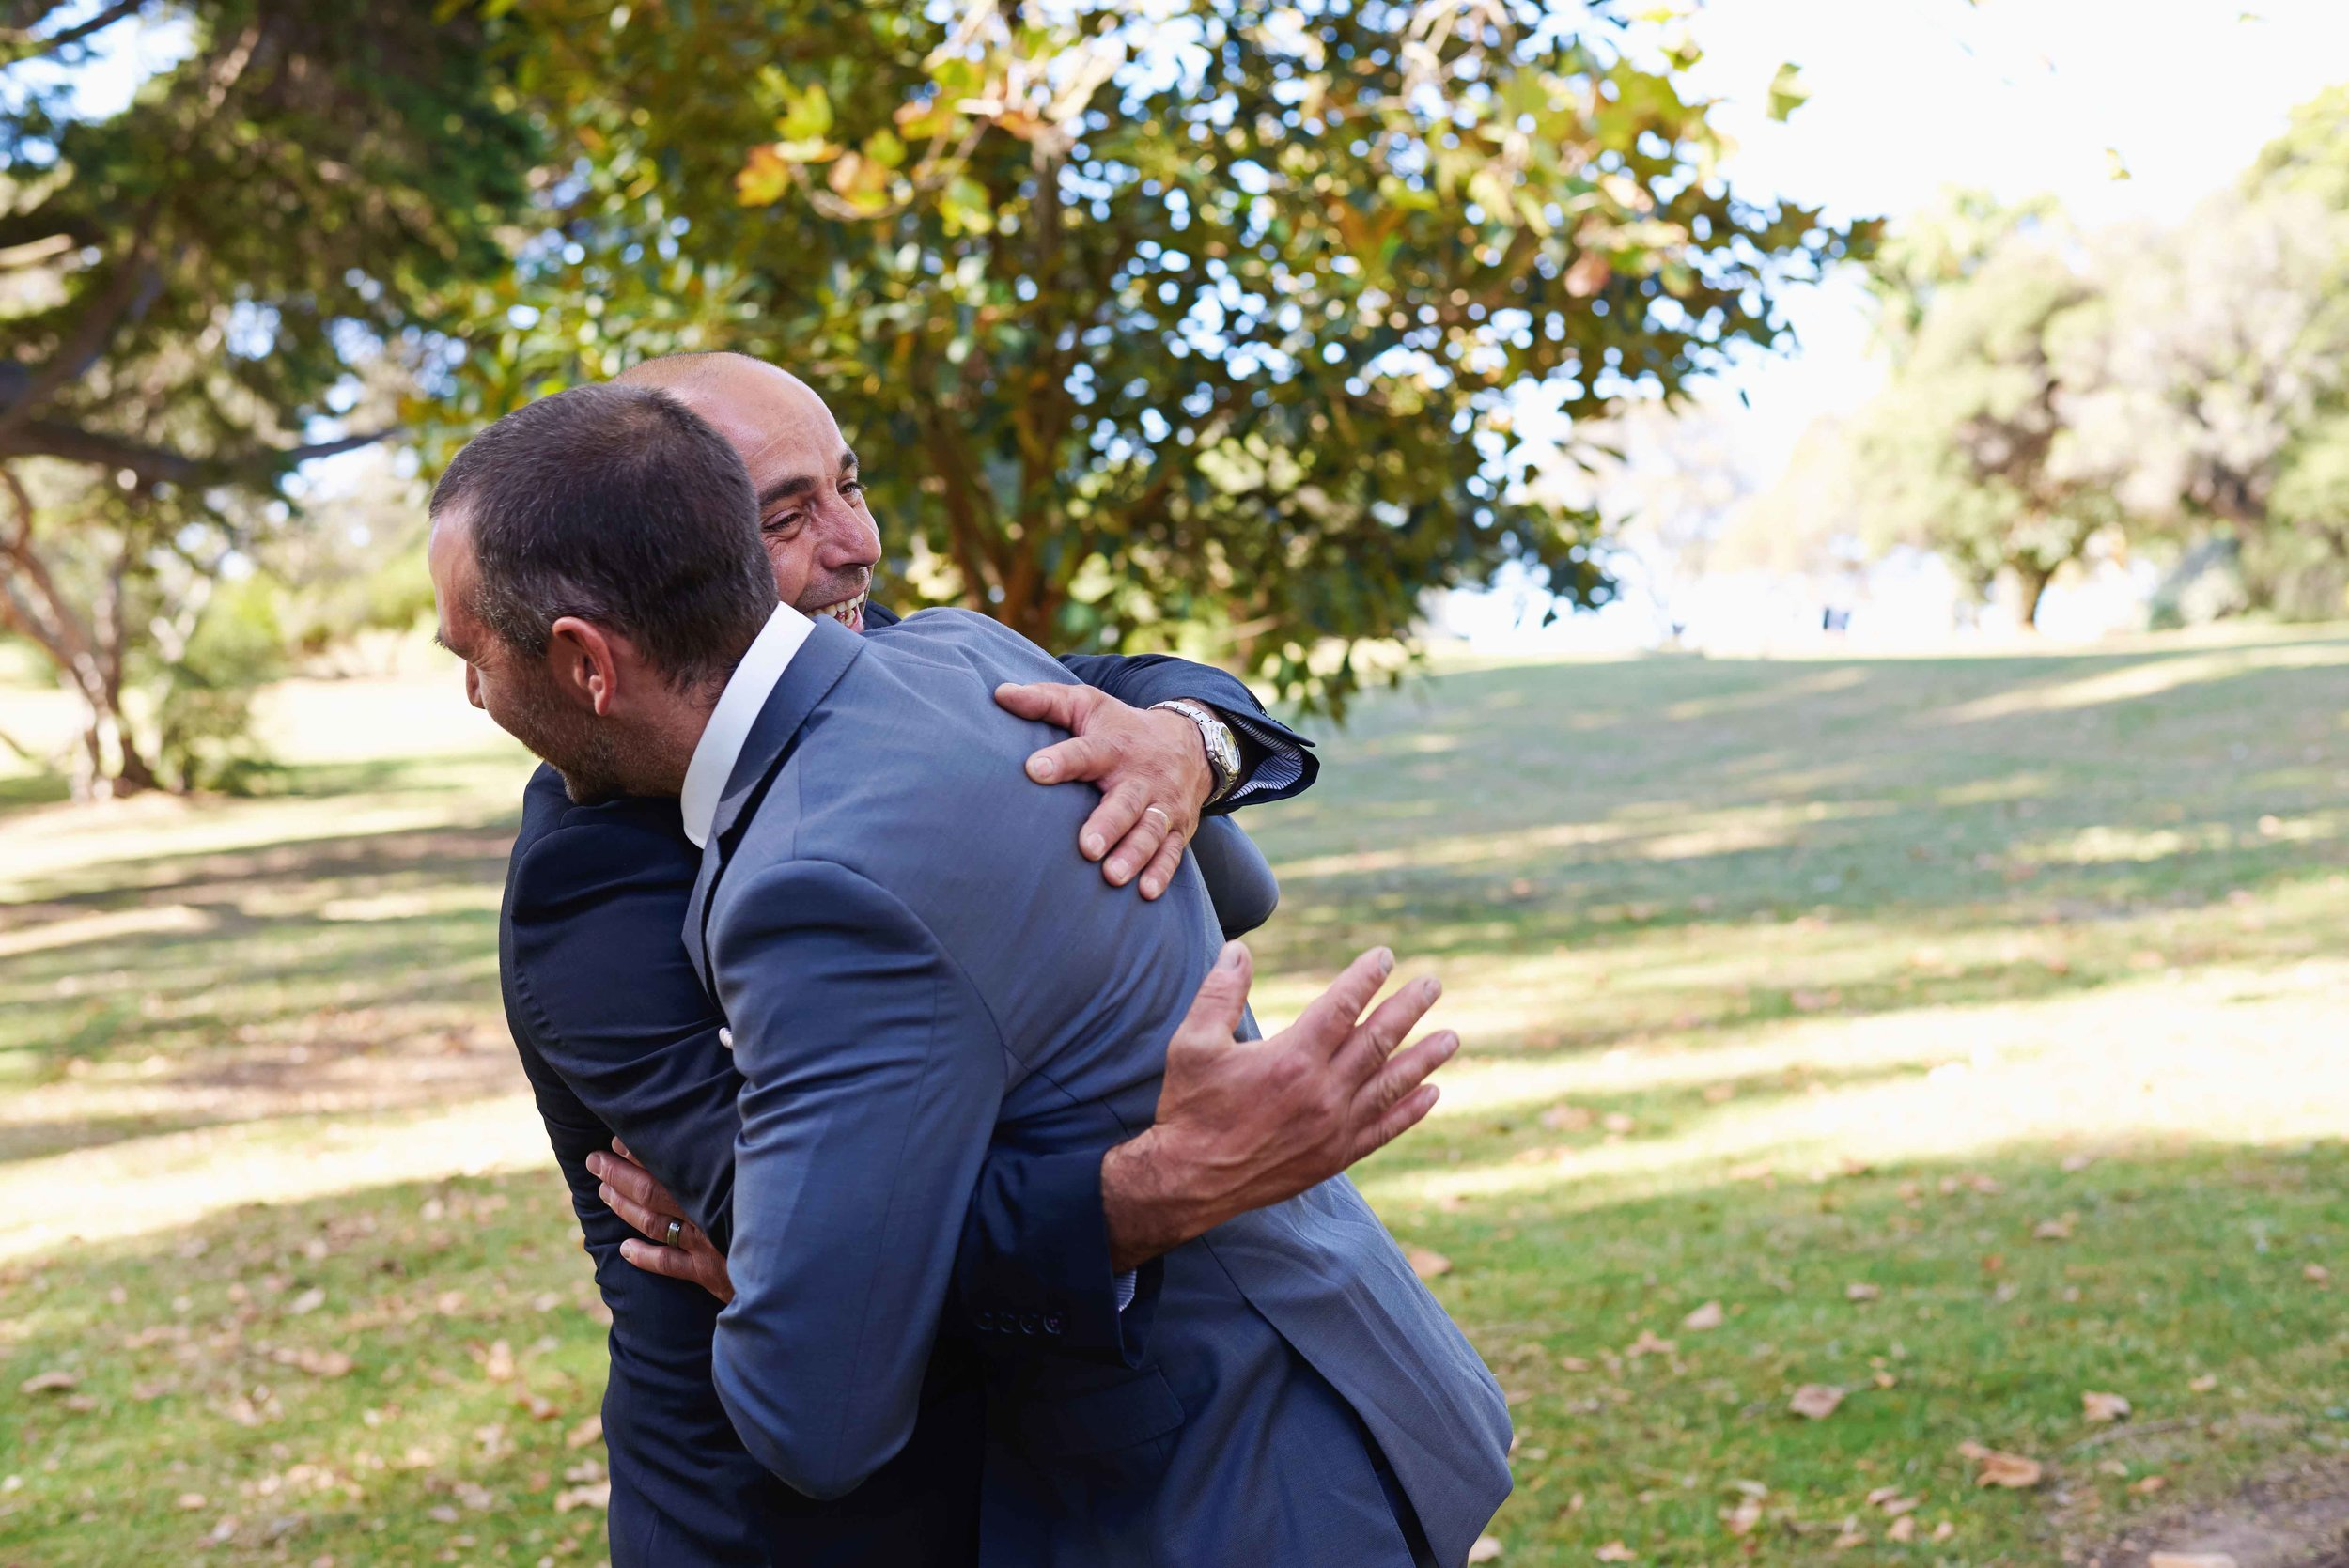 sorrento-wedding-photography-all-smiles-marissa-jade-photography-132.jpg